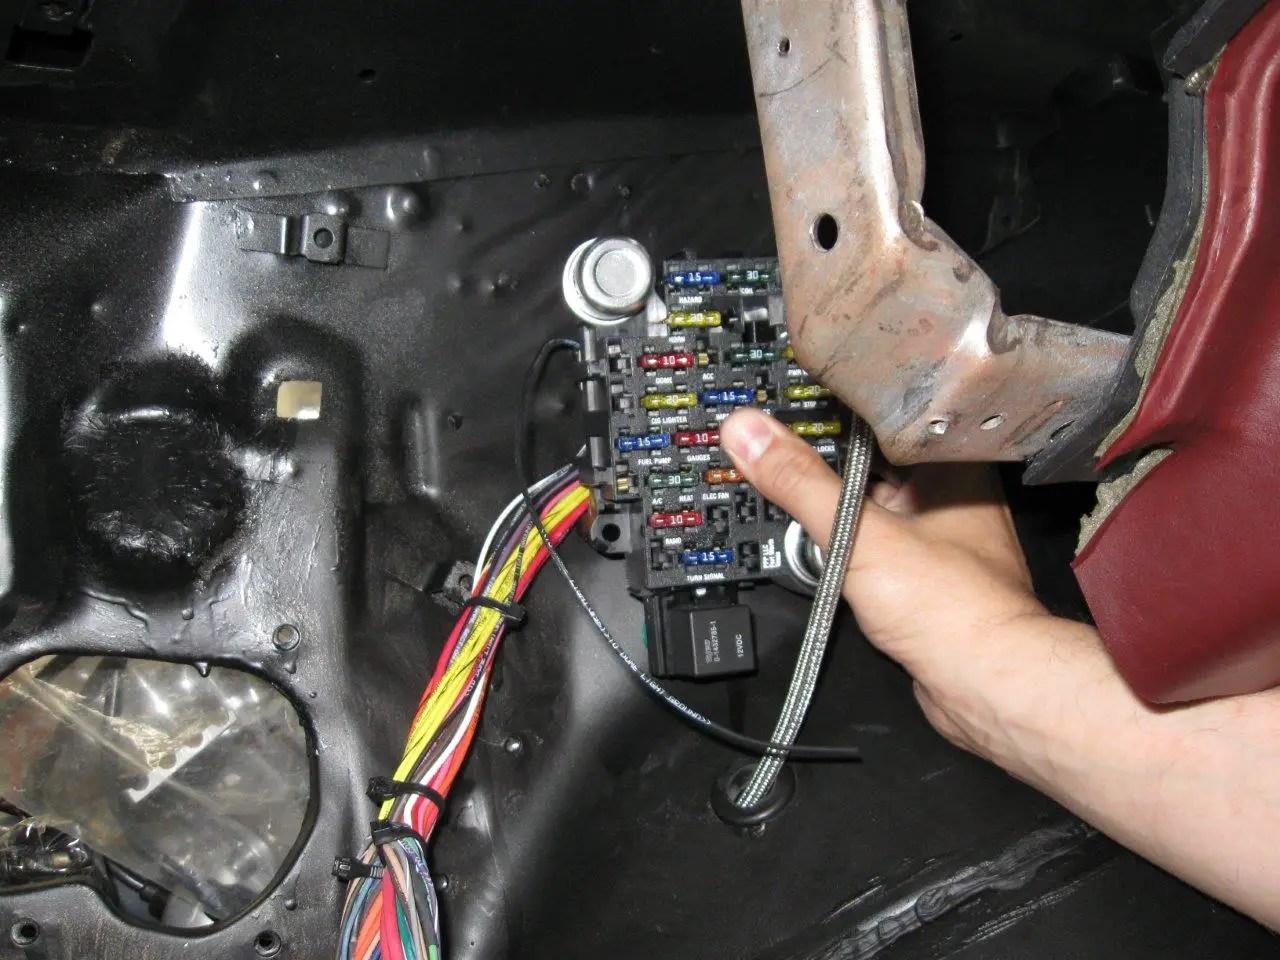 2015 Camaro Fuse Box Quot Painless Quot Gbodyforum 78 88 General Motors A G Body